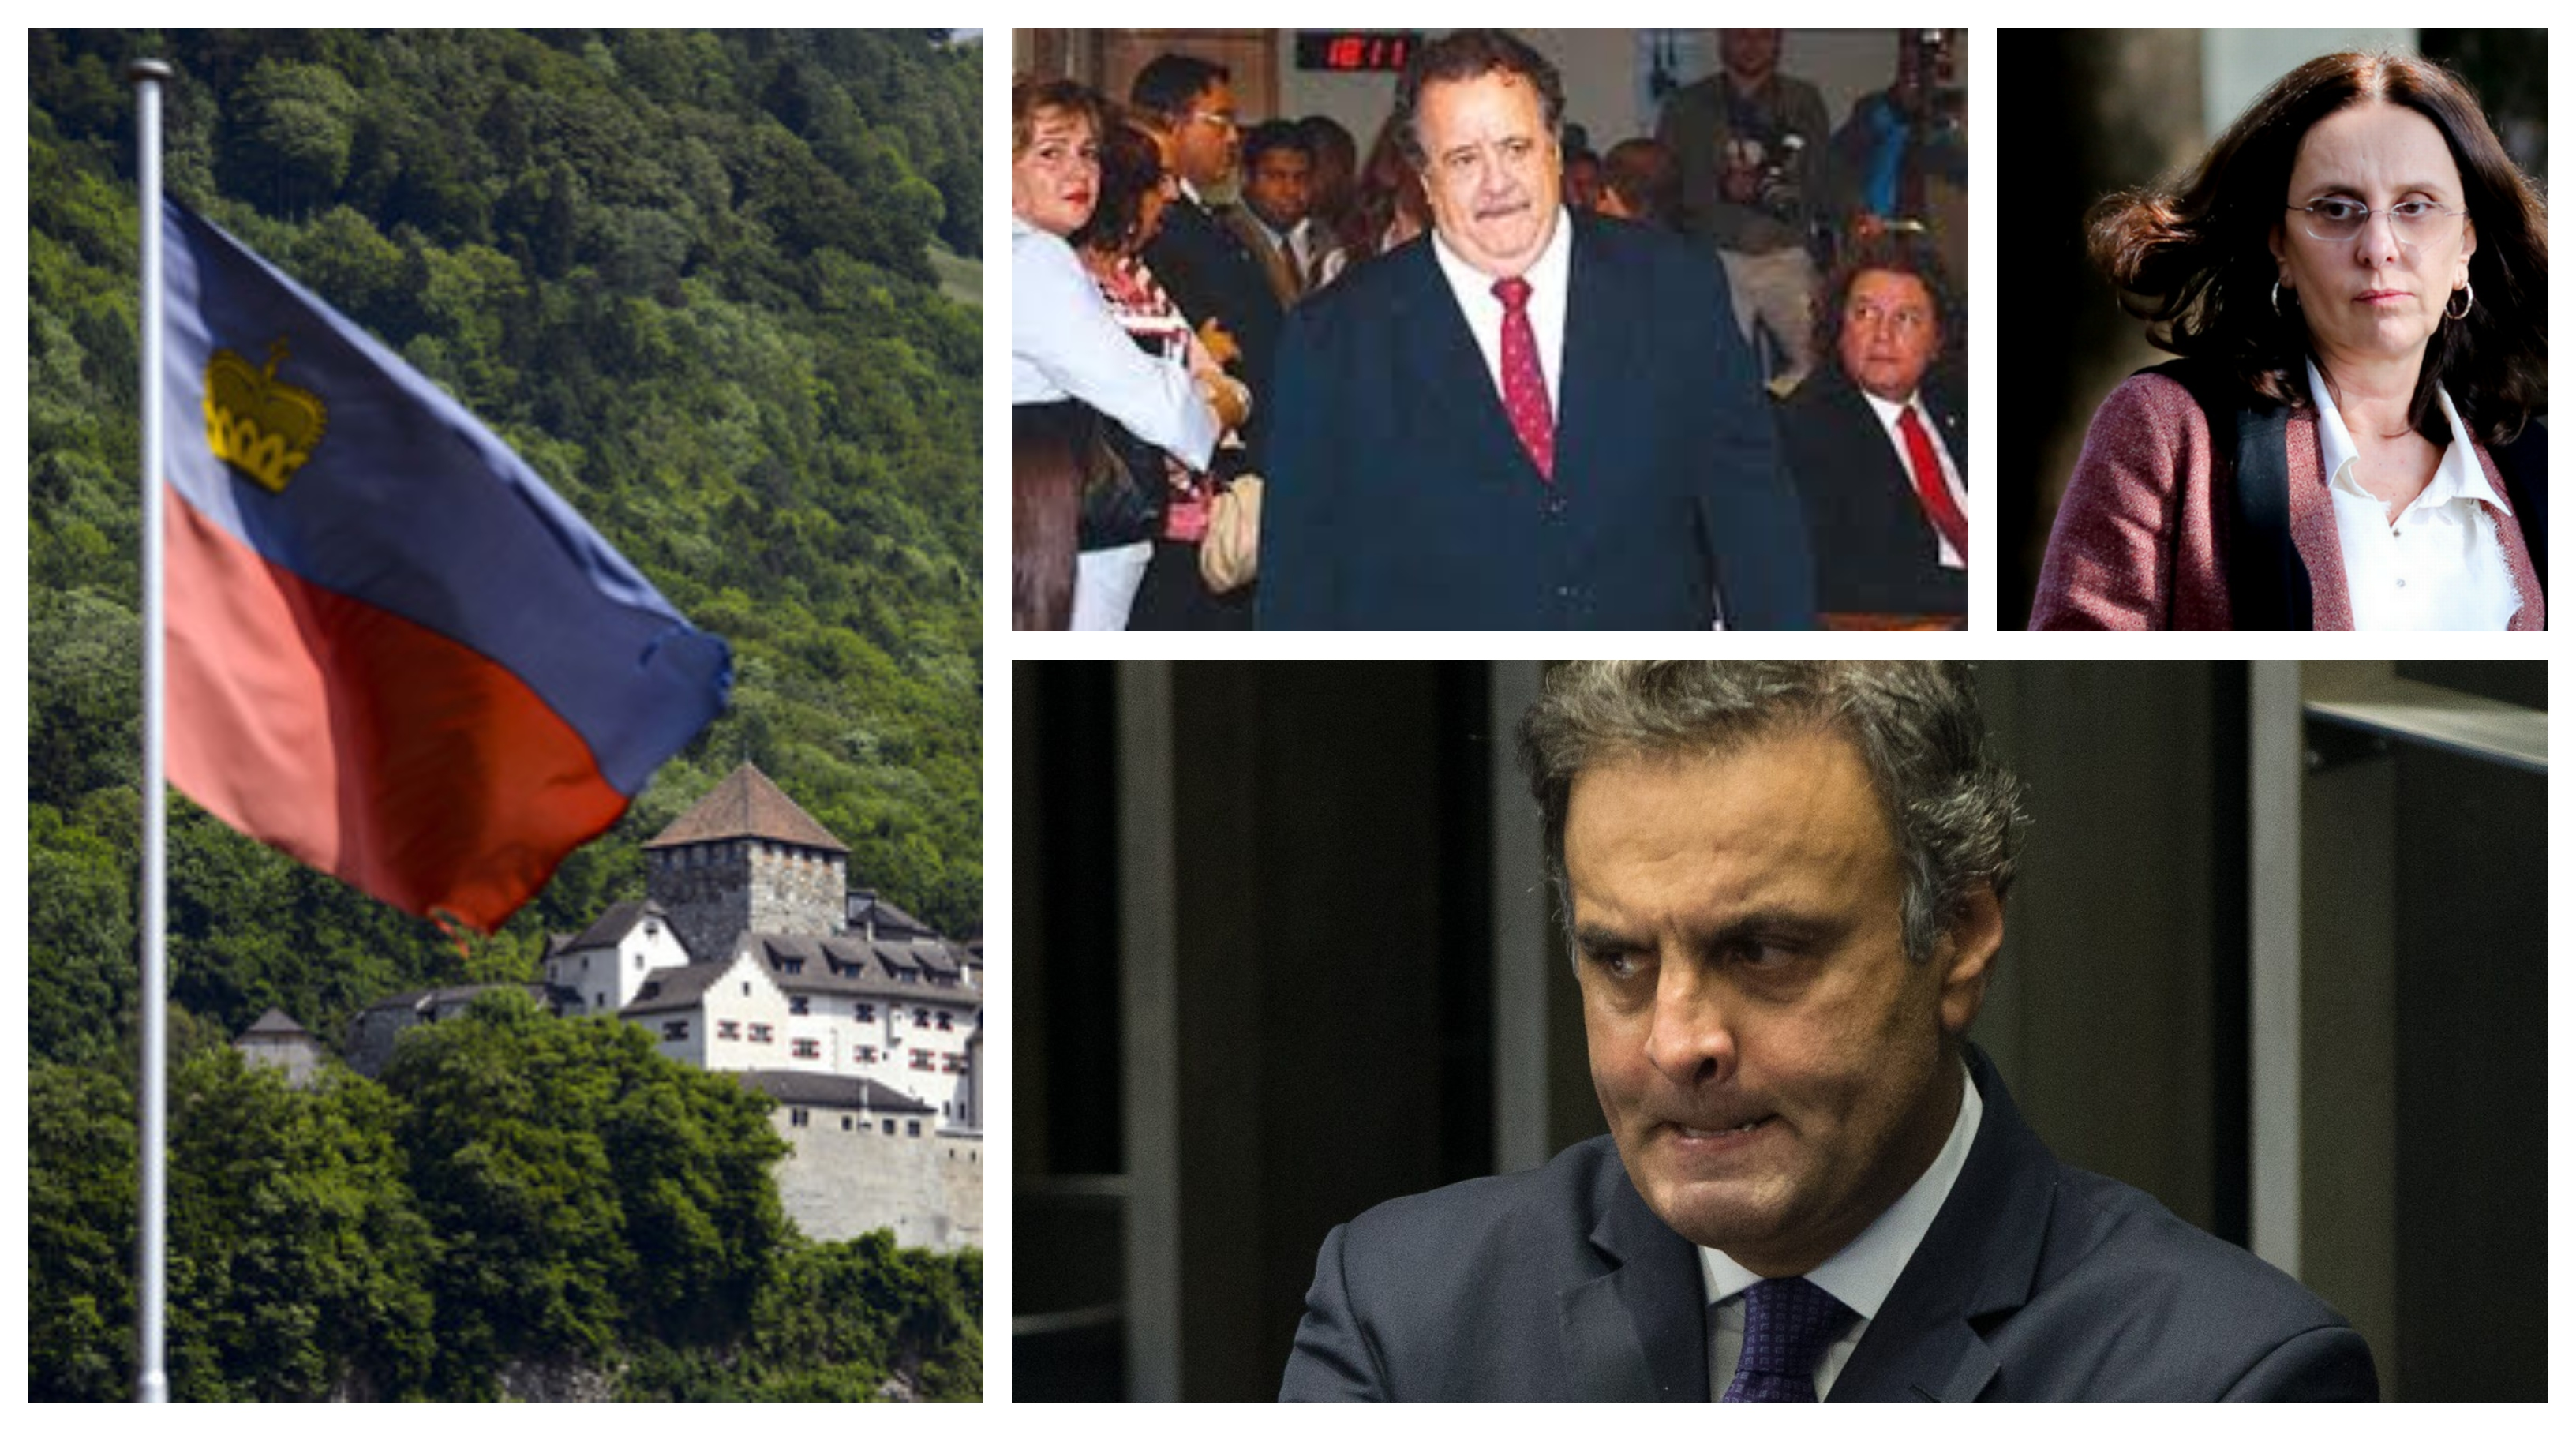 Carone, exclusivo: STF adia julgamento de contas secretas deAécio e Dimas Toledo em paraíso fiscal